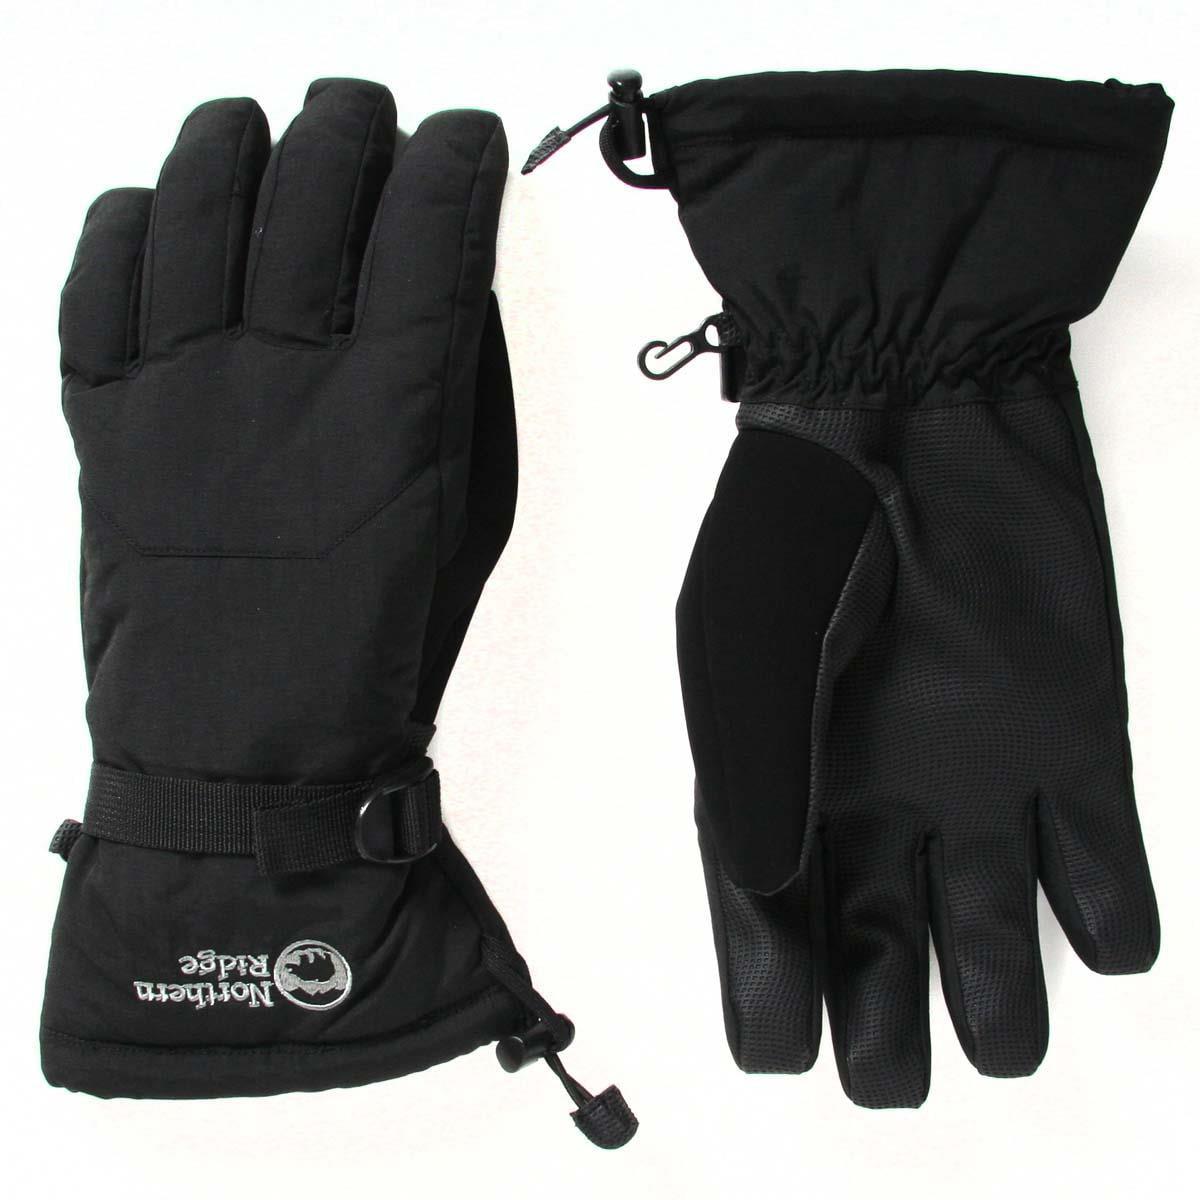 Northern Ridge Mountain Range Gloves by